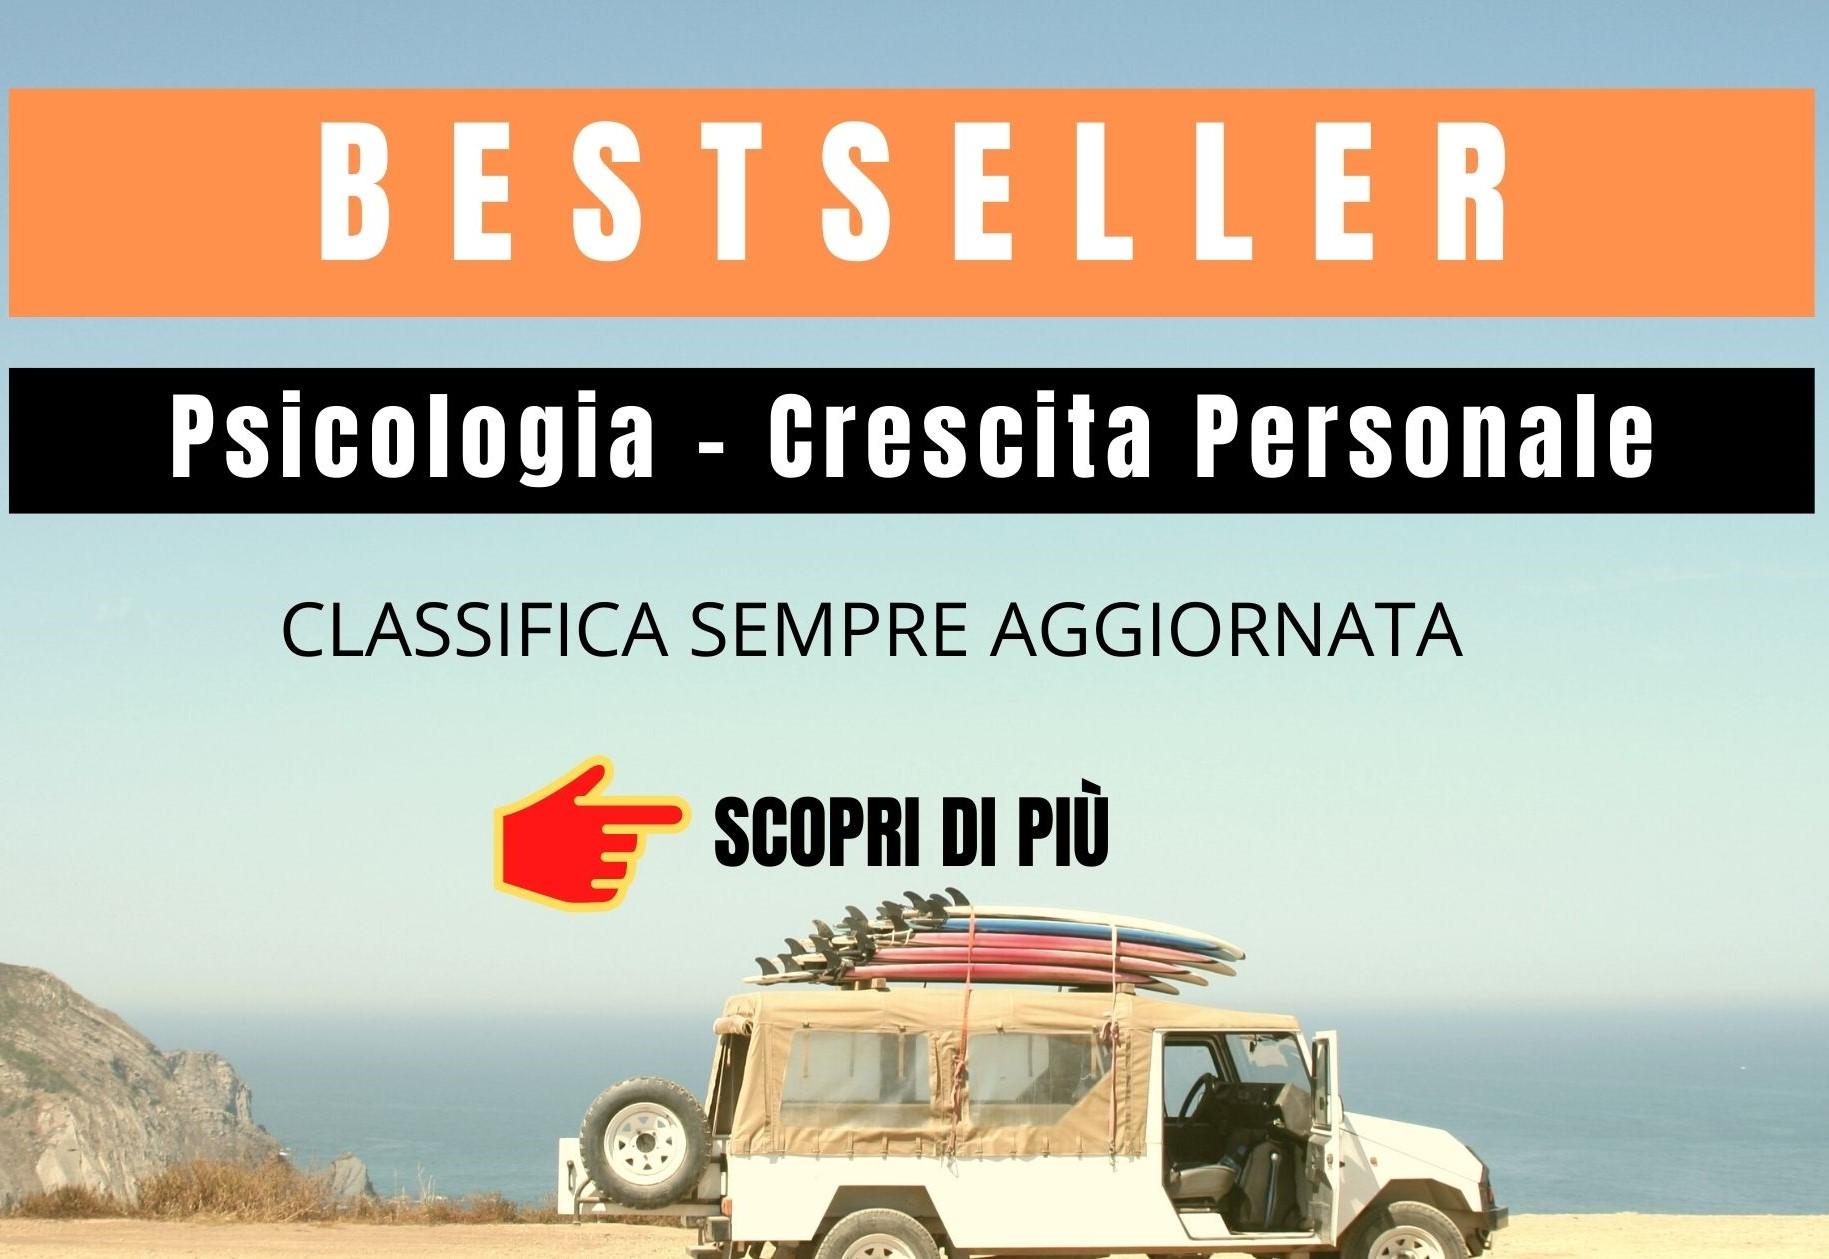 bestseller psicologia